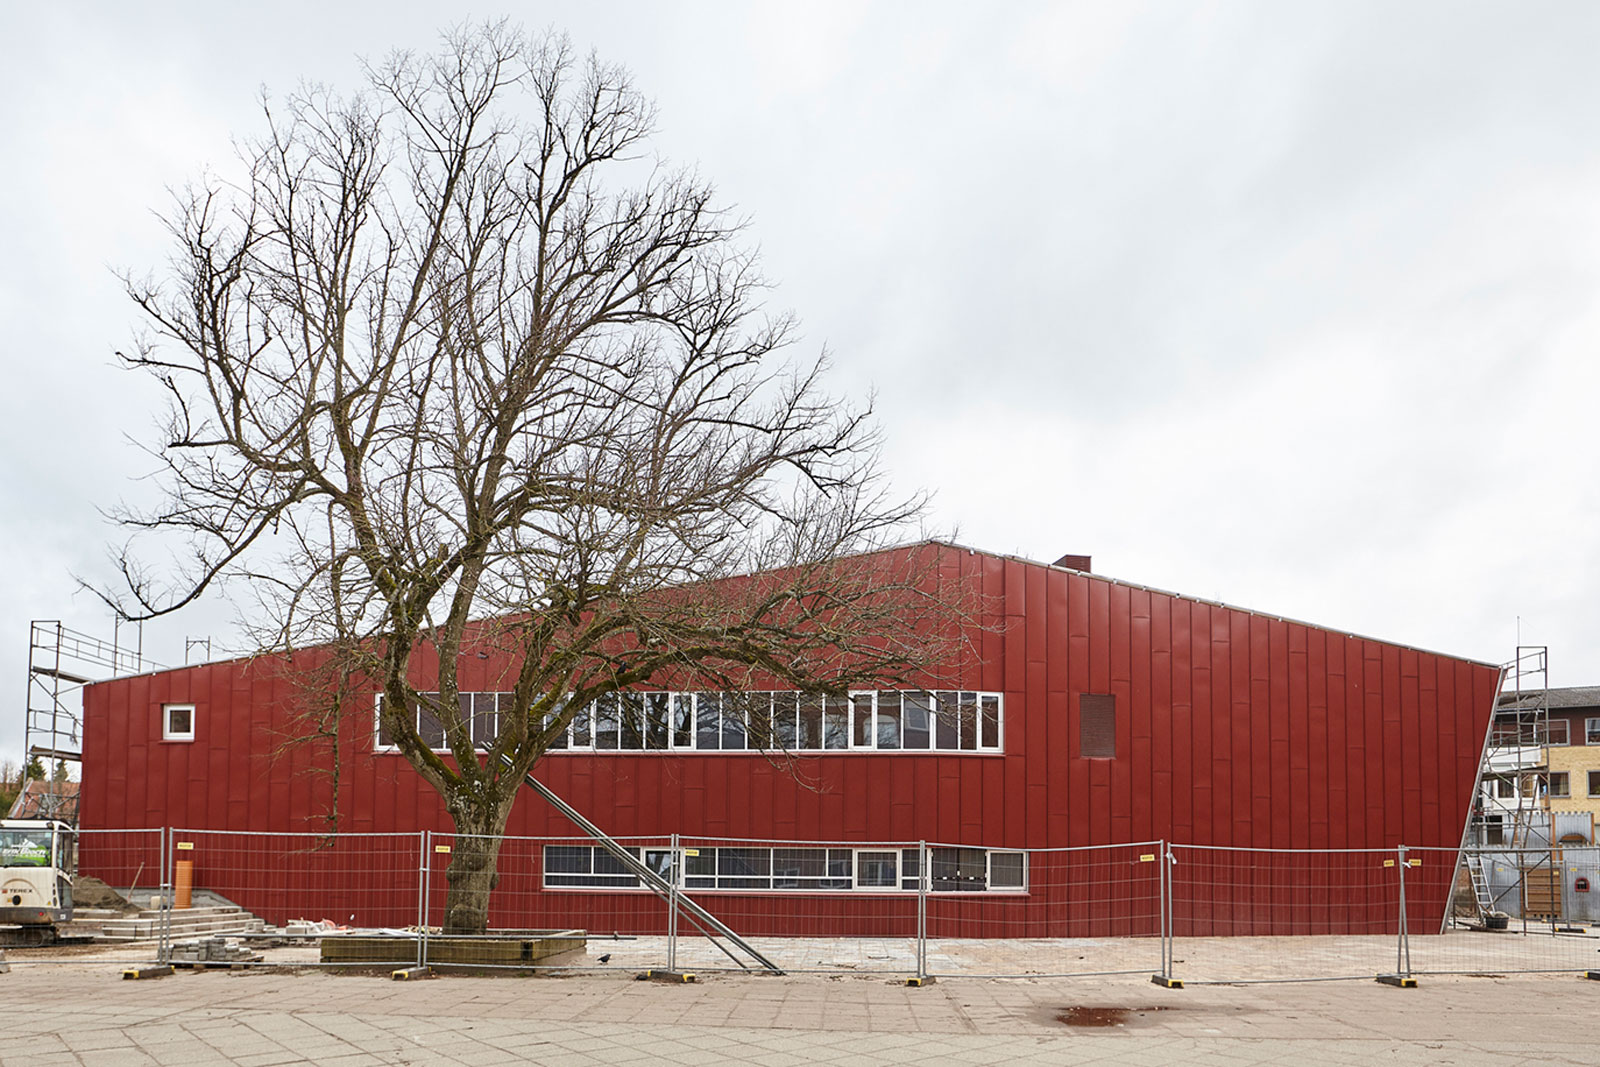 Hobrovejens-Skole-Randers-Multihal-V05-1600x1067px